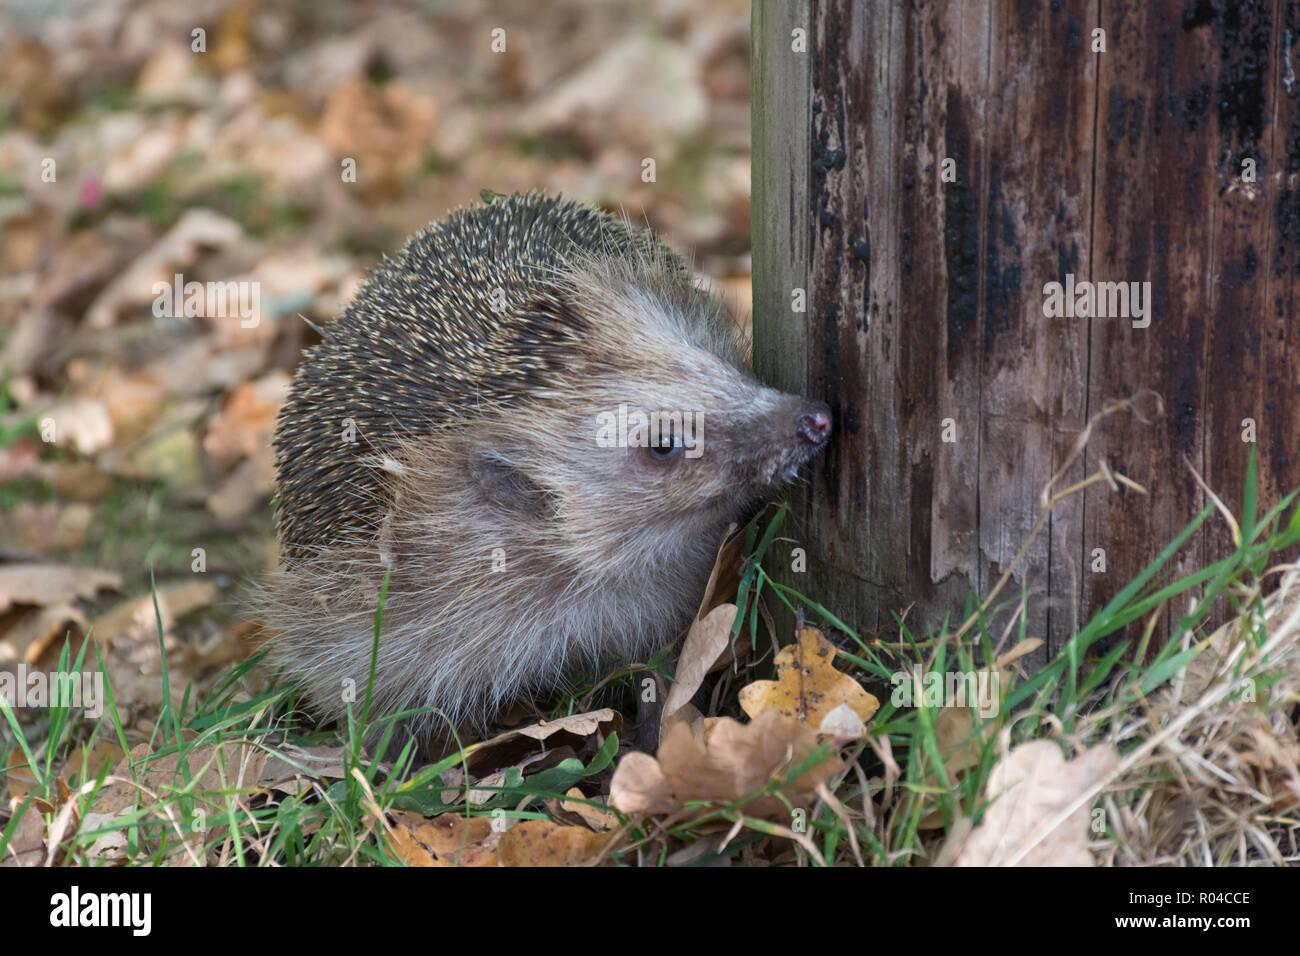 european-hedgehog-erinaceus-europaeus-R04CCE.jpg